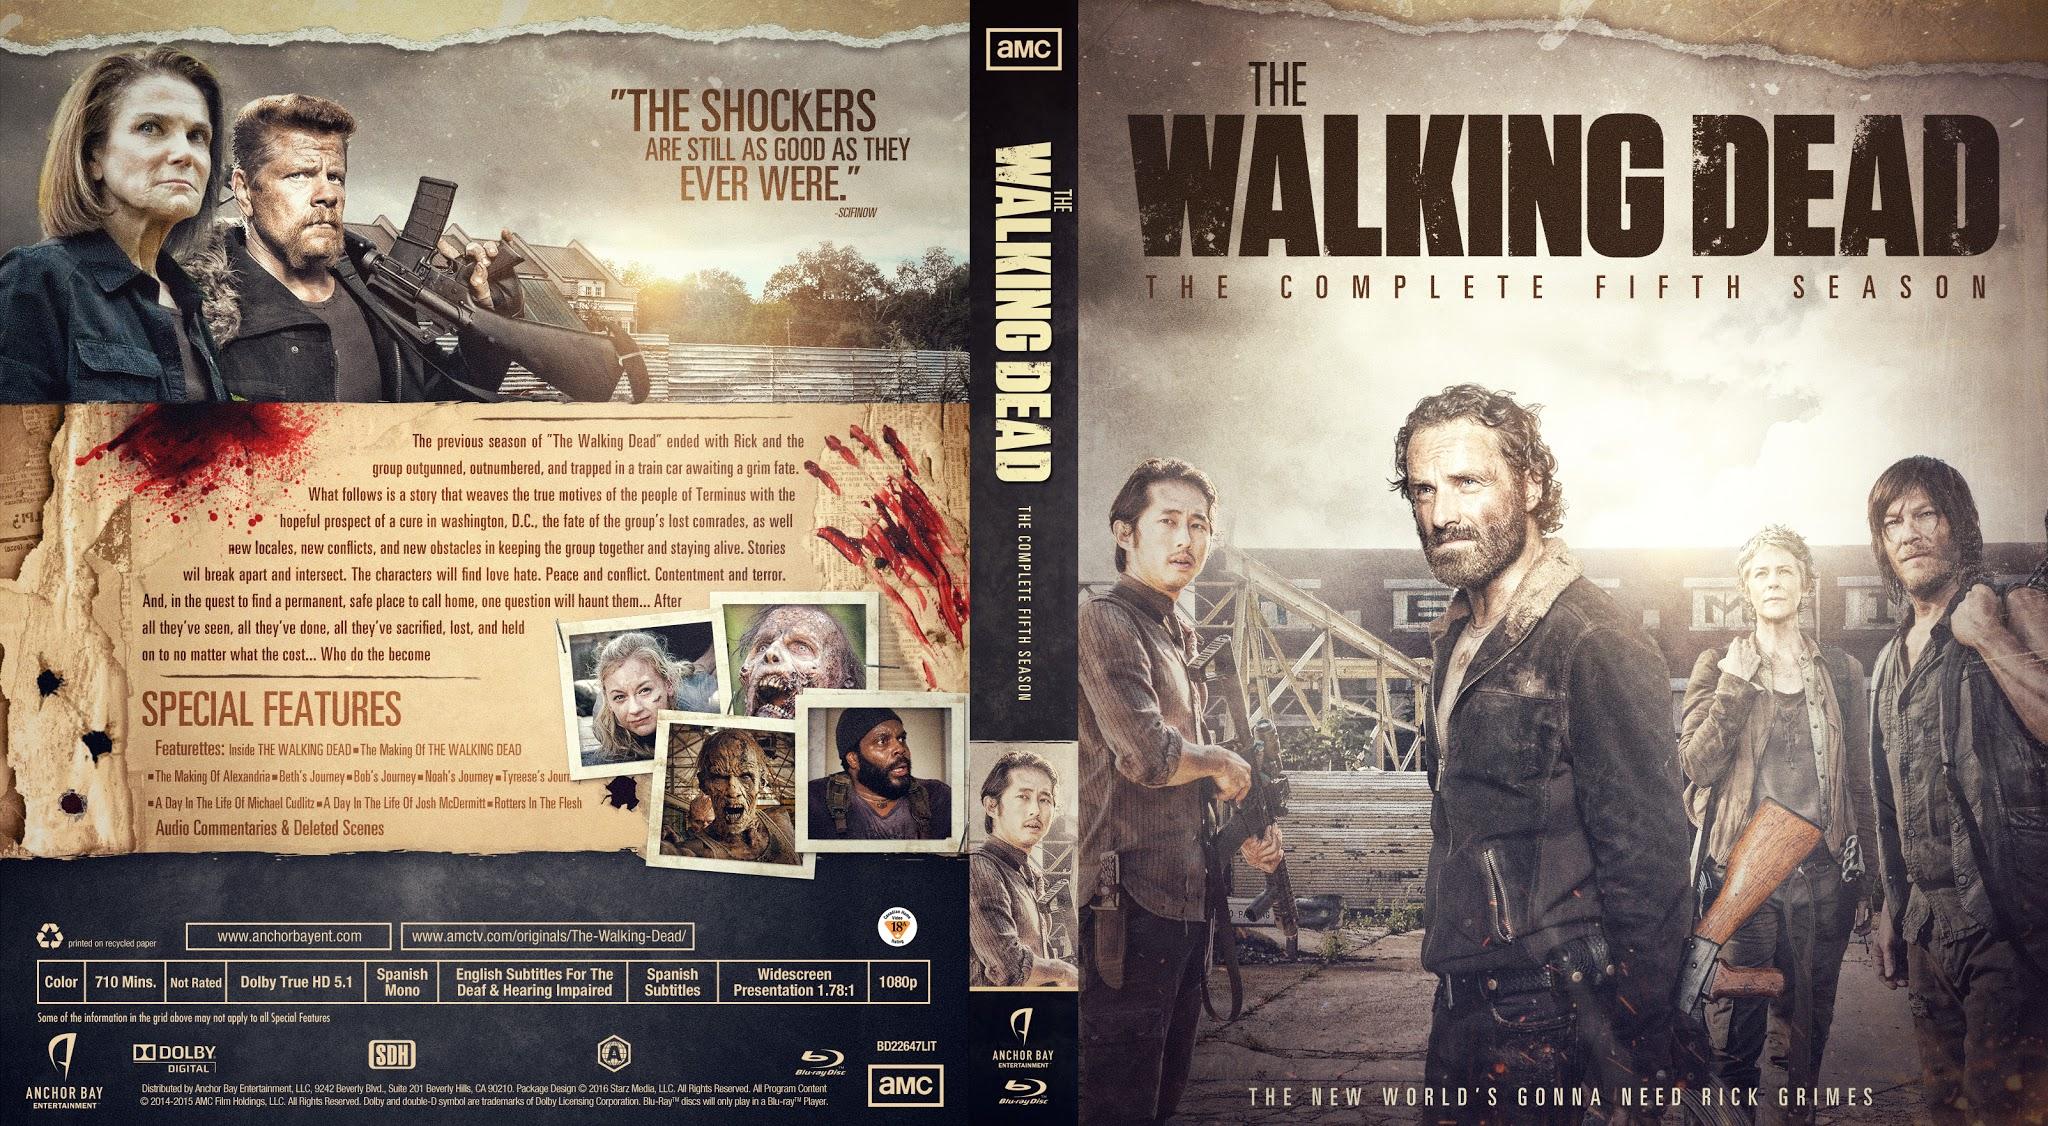 the walking dead 1080p subtitles